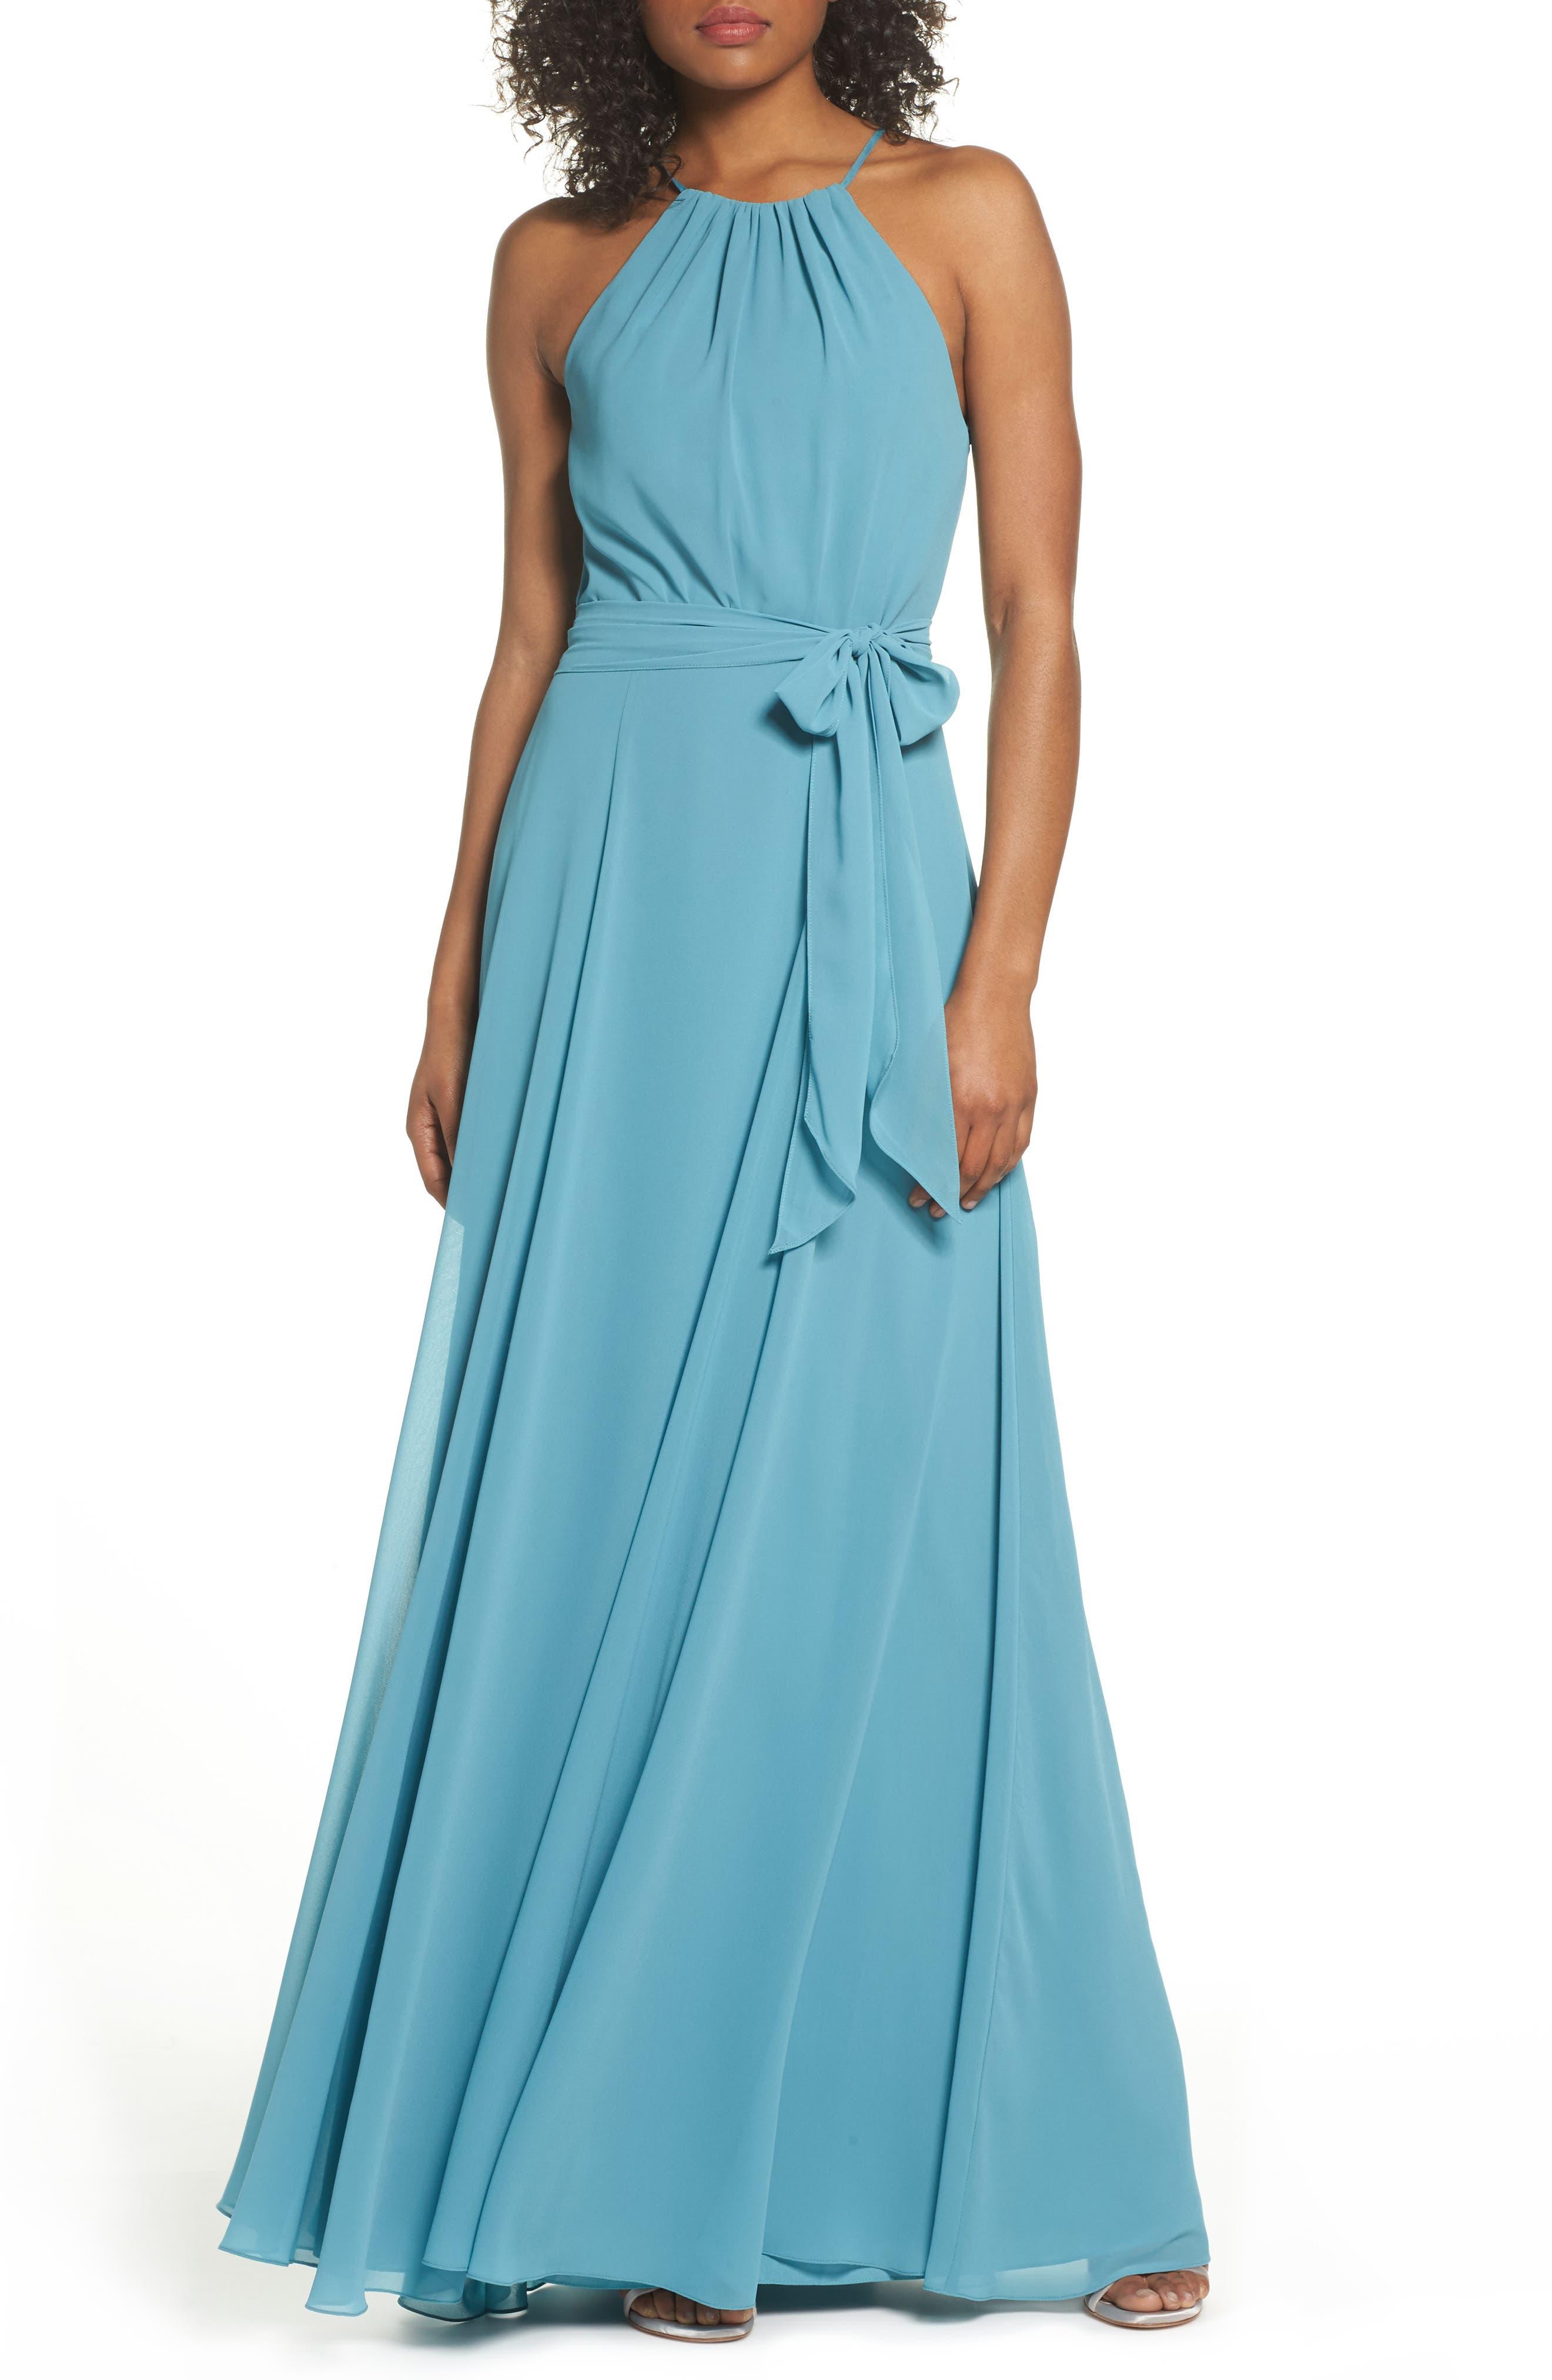 Amsale Kyra Chiffon Halter Gown